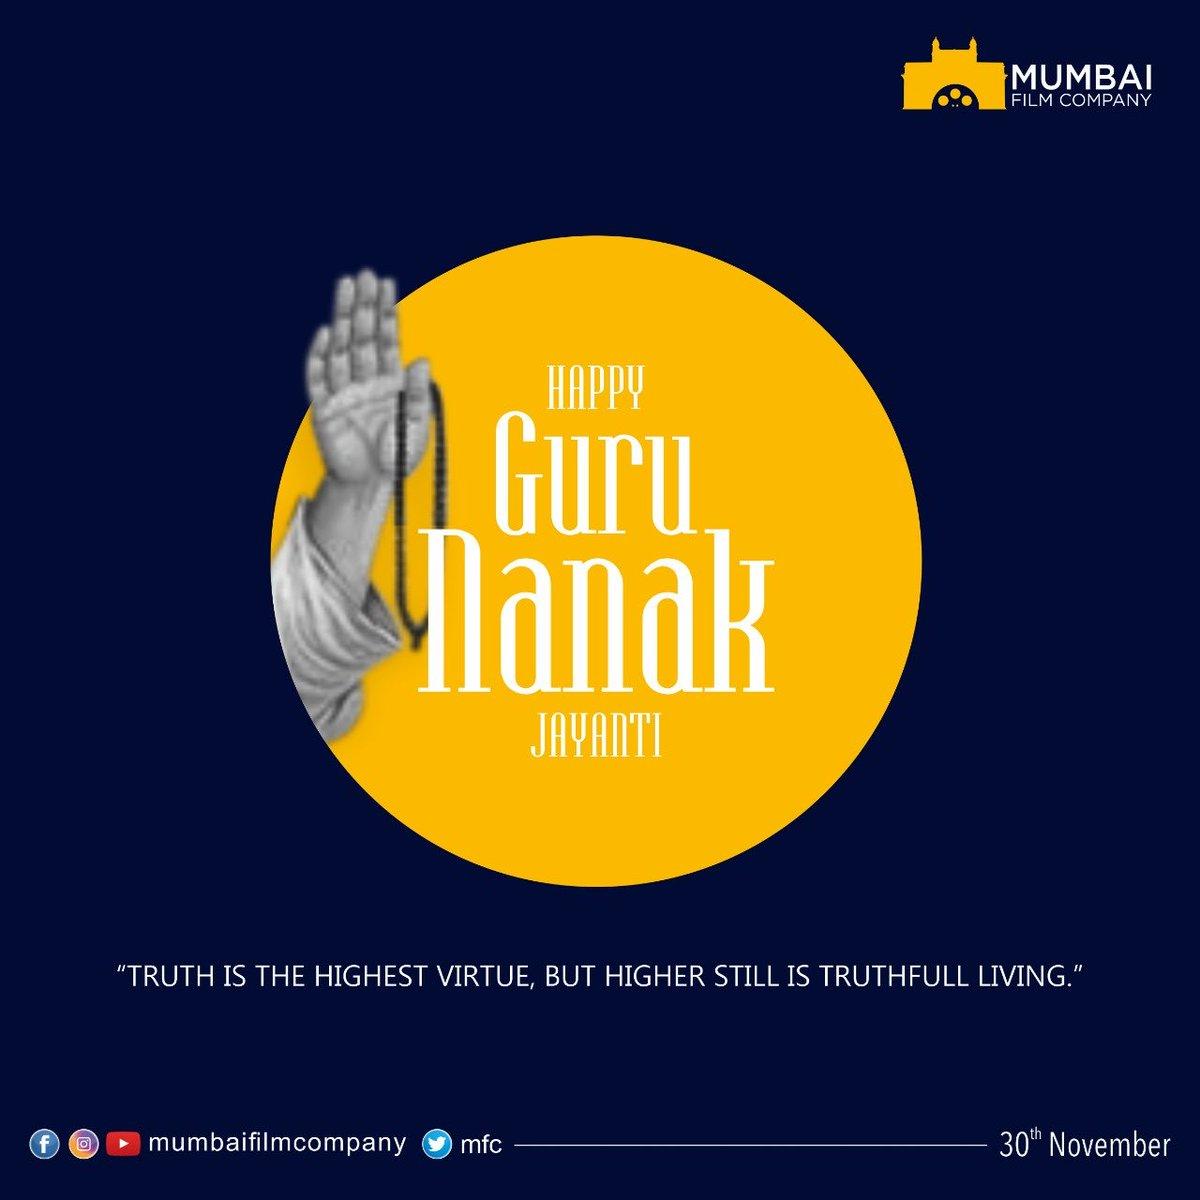 Greetings to all on this auspicious day. #gurupurab #GuruNanakJayanti2020